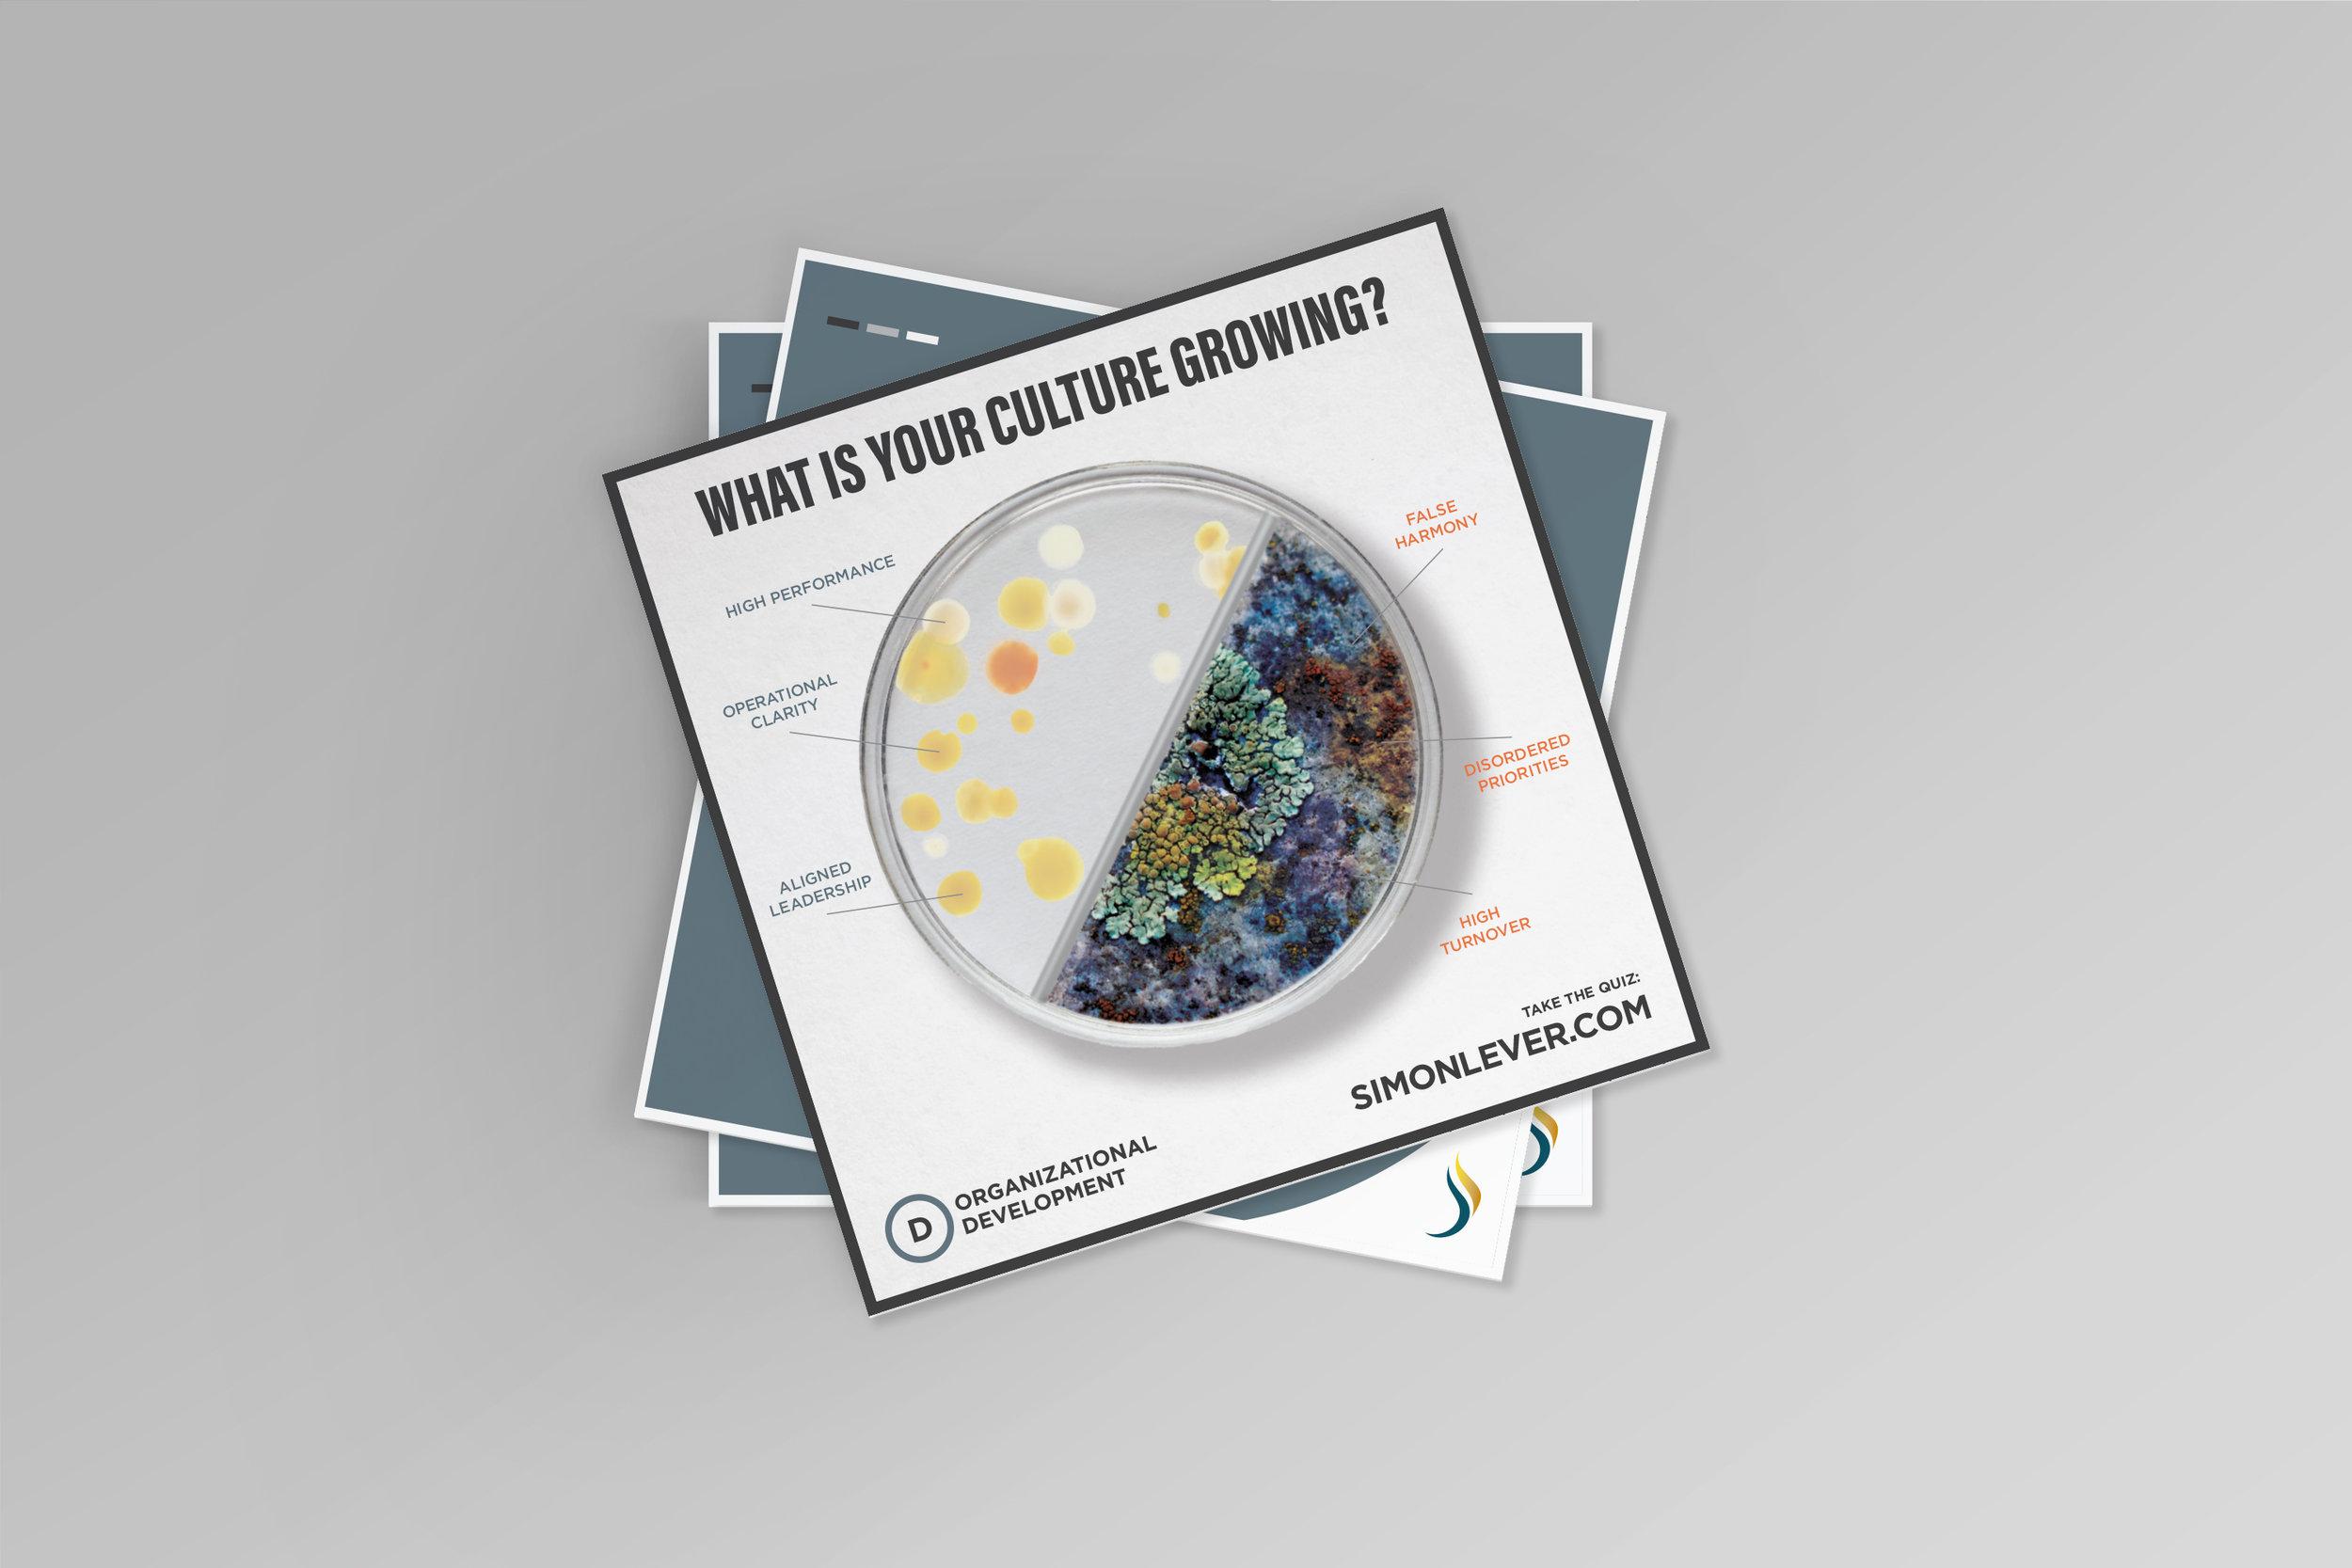 SimonLever-OrganizationalDevelopment-Business-GraphicDesign-PeteDesignCompany-Branding-CharCo–Office-BrandIdentity